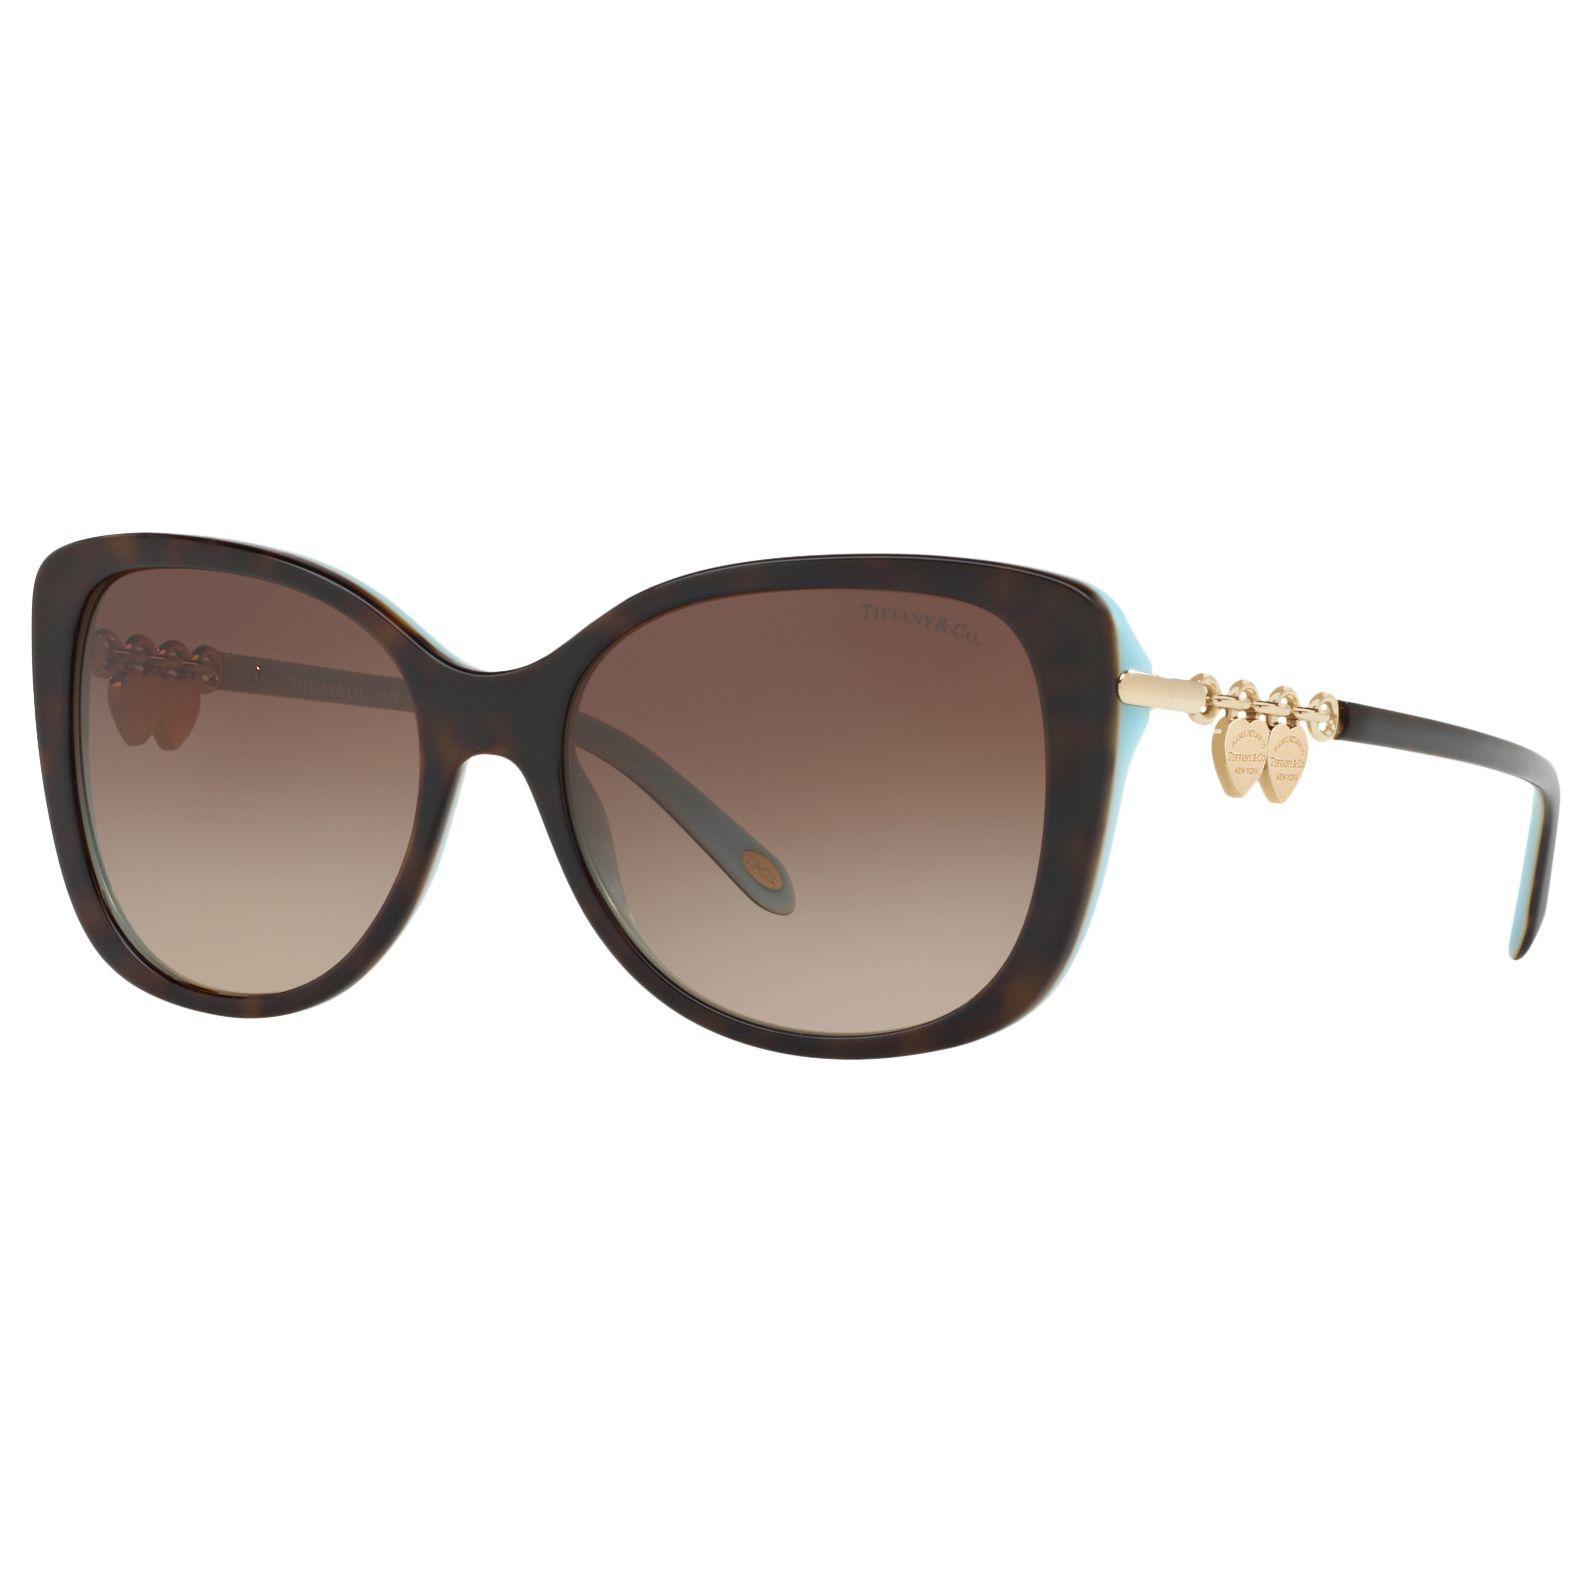 Tiffany & Co Tiffany & Co TF4129 Rectangular Sunglasses, Tortoise/Brown Gradient